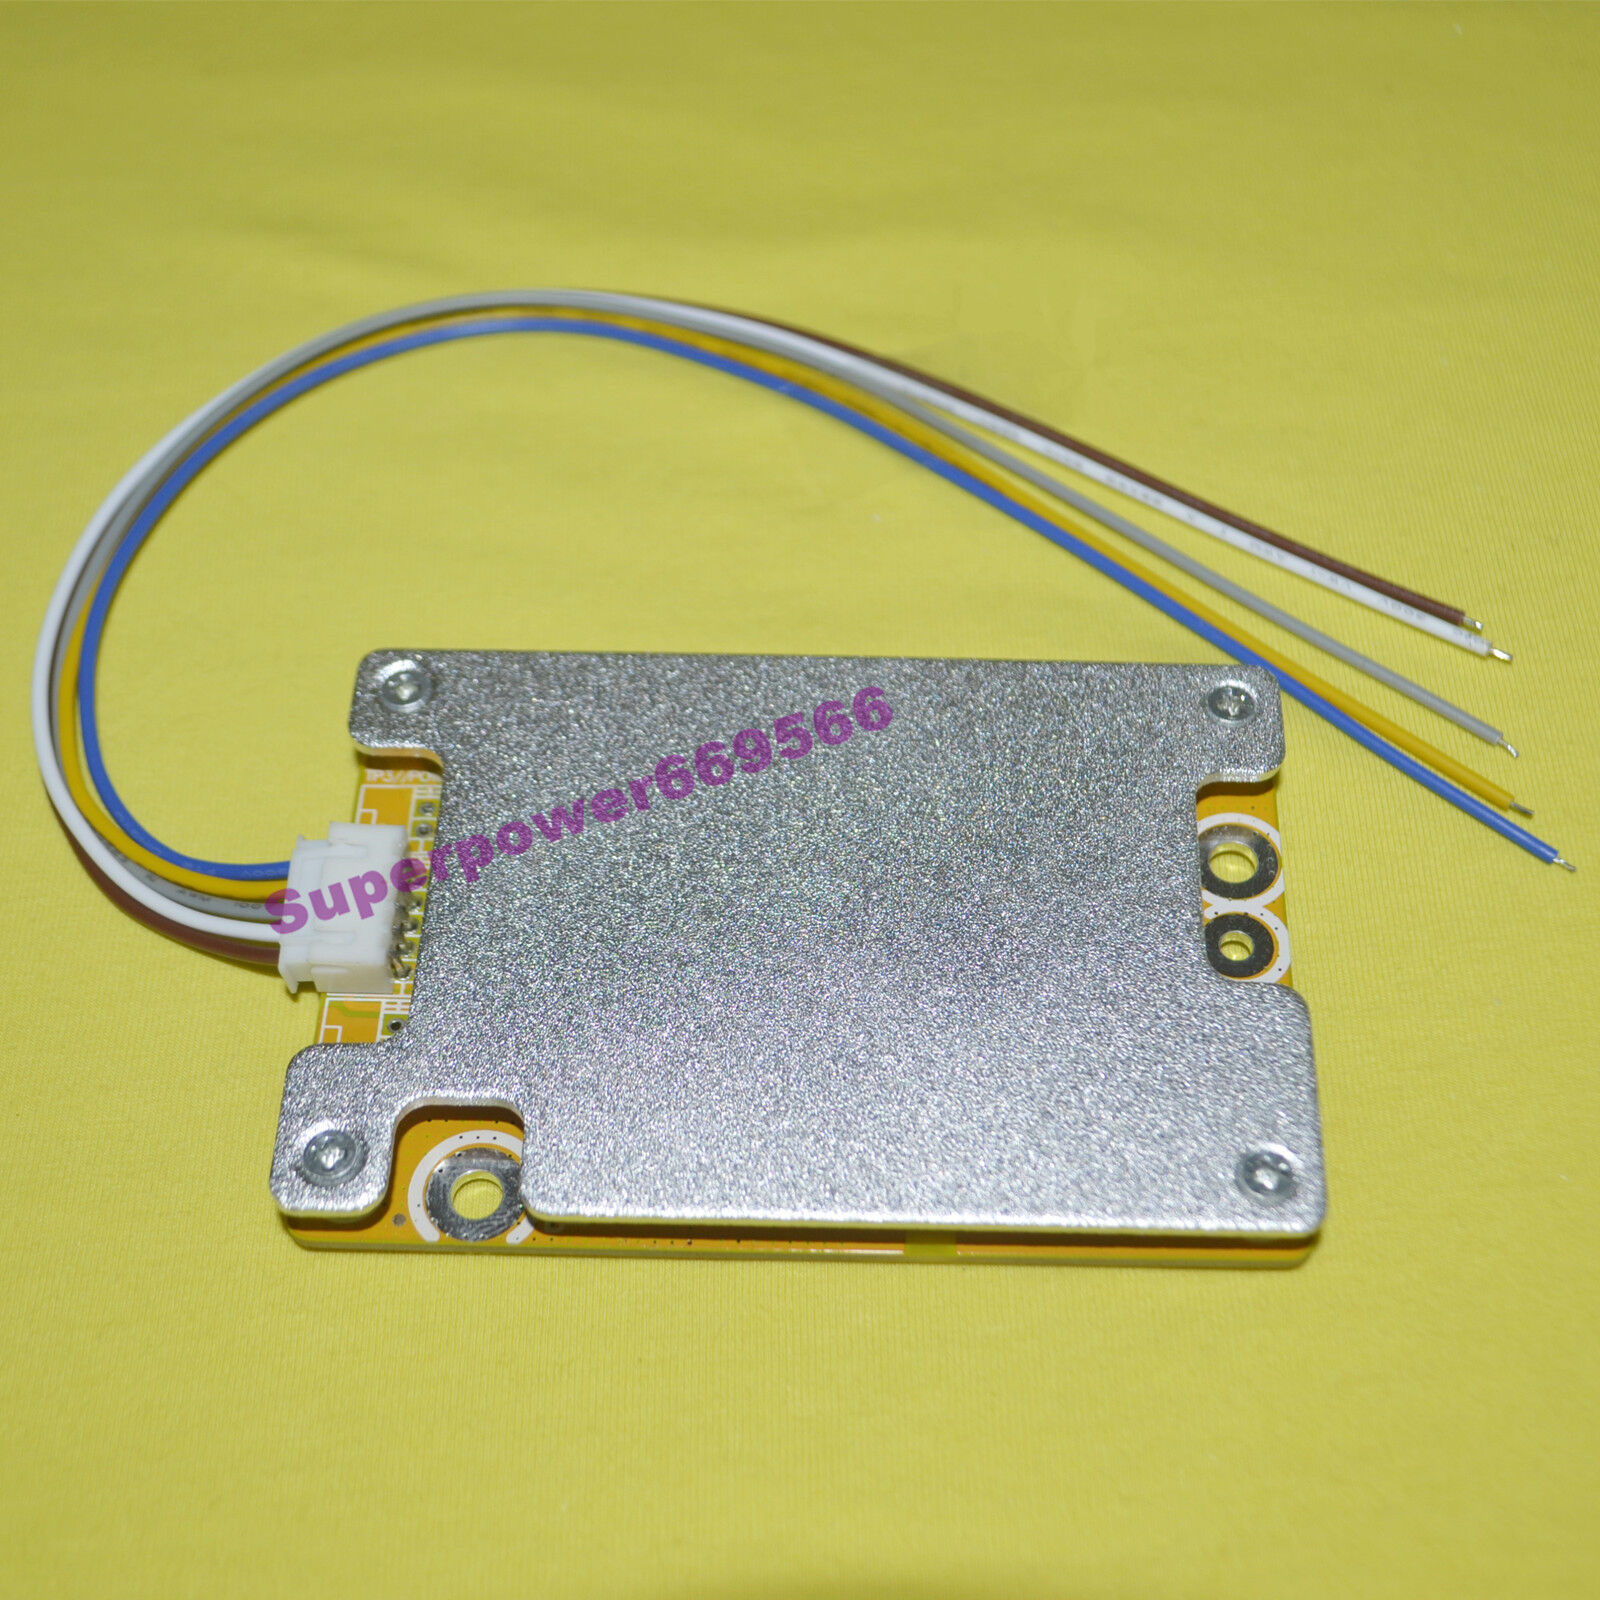 12V 14.8V 4S 60A BMS PCB PCM for LiFePO4 4S Li-ion LIPO Battery with BALANCE